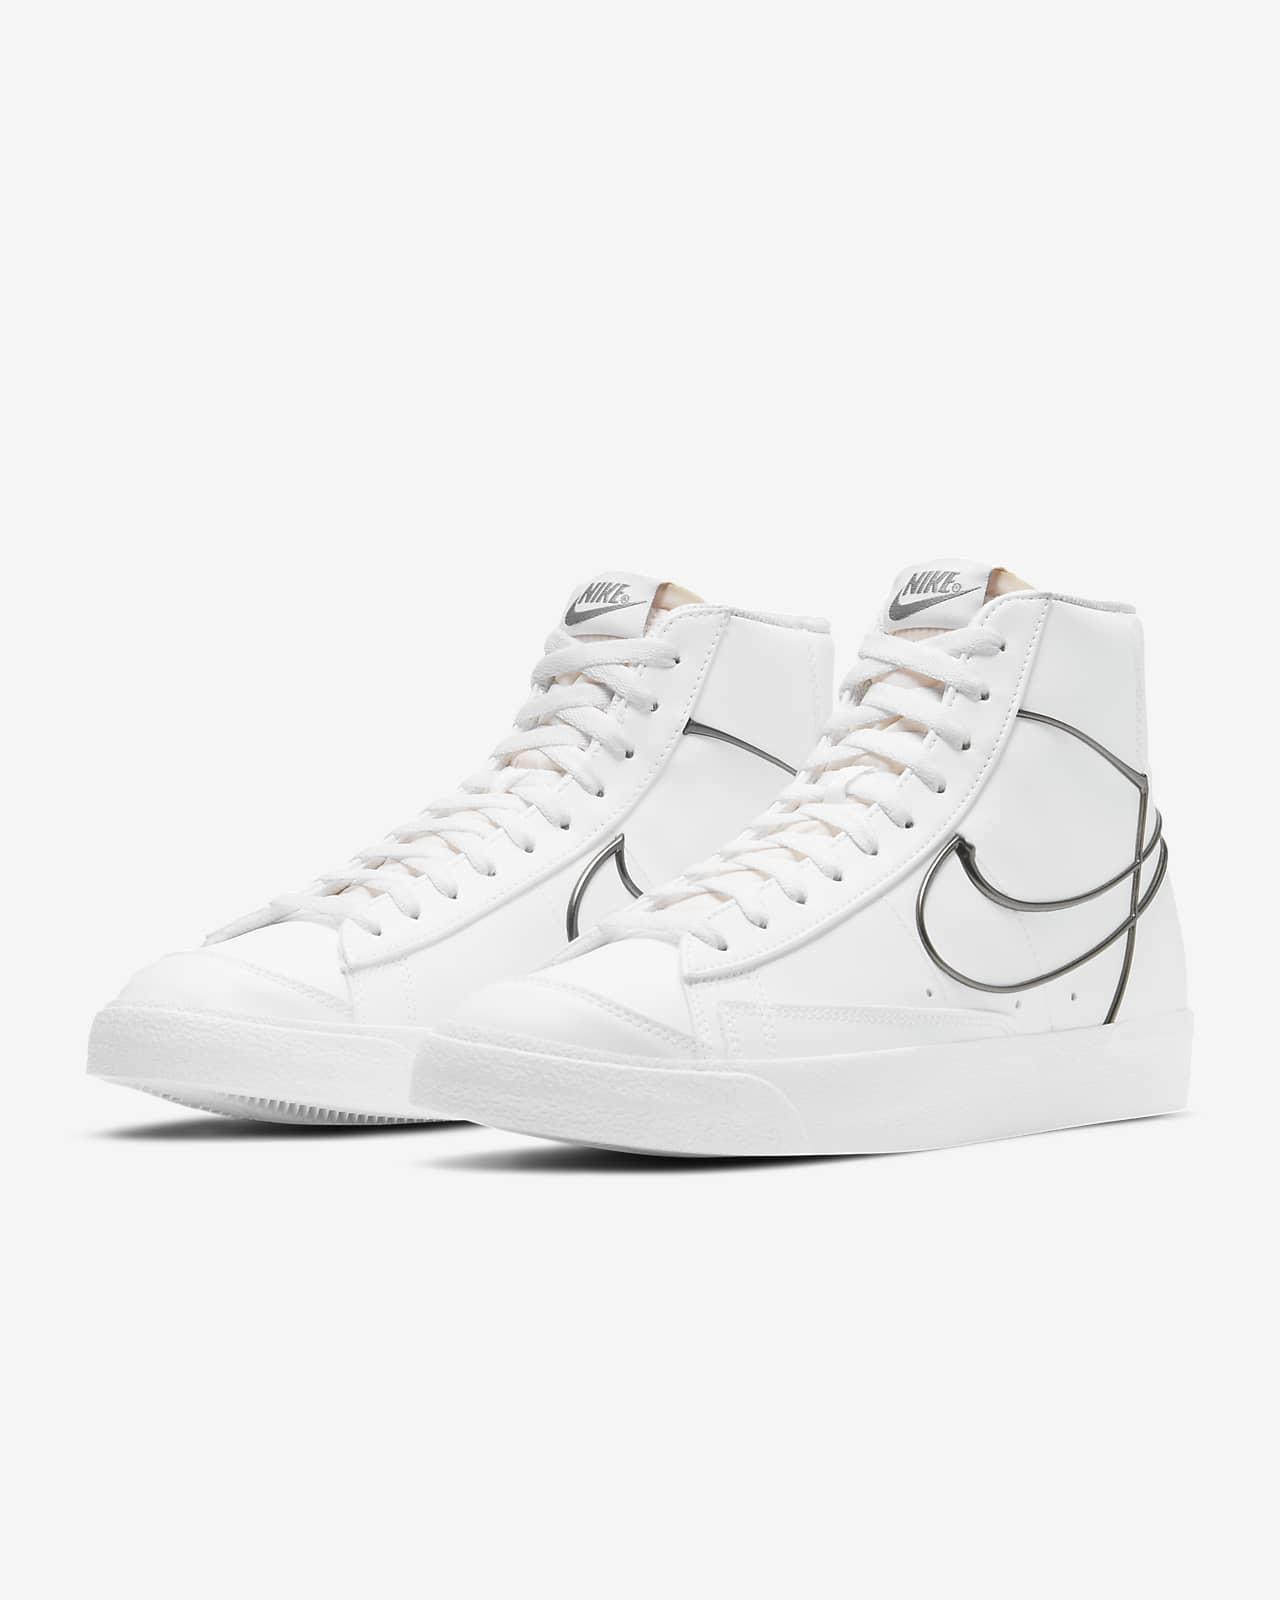 Nike Blazer Mid '77 Men's Shoe. Nike LU